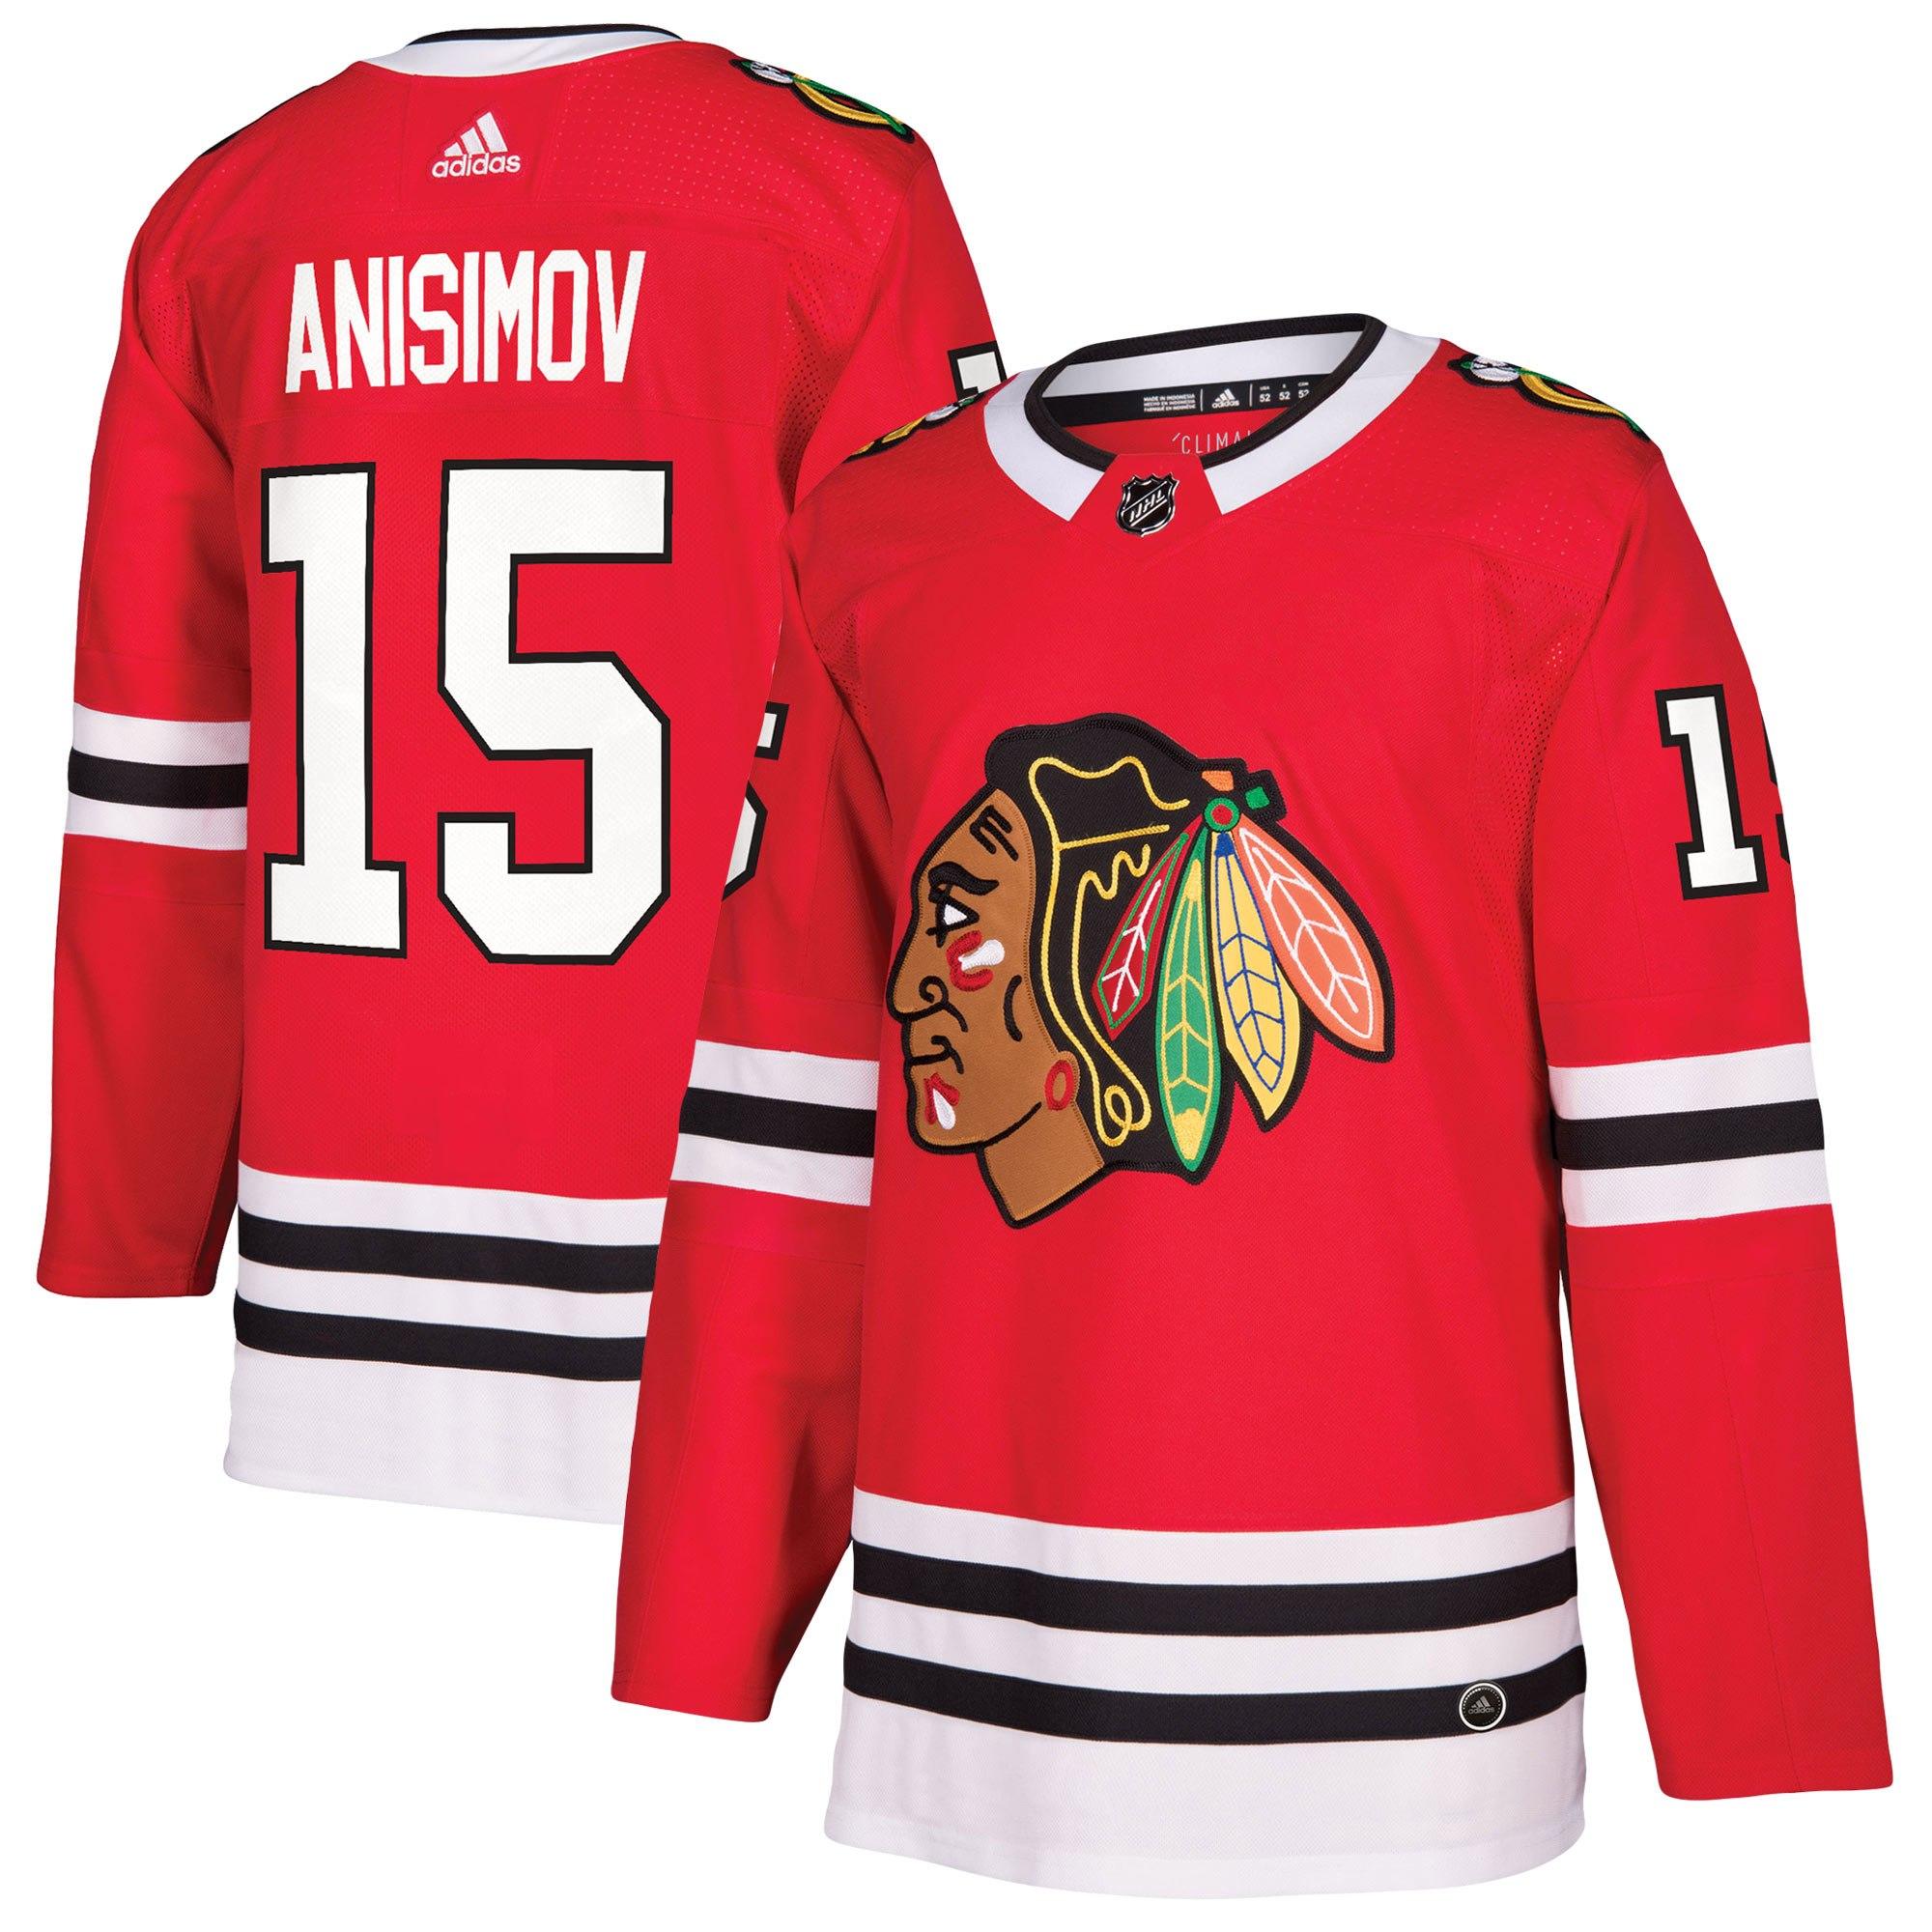 Adidas Dres Chicago Blackhawks #15 Artem Anisimov adizero Home Authentic Player Pro Velikost: L, Distribuce: USA